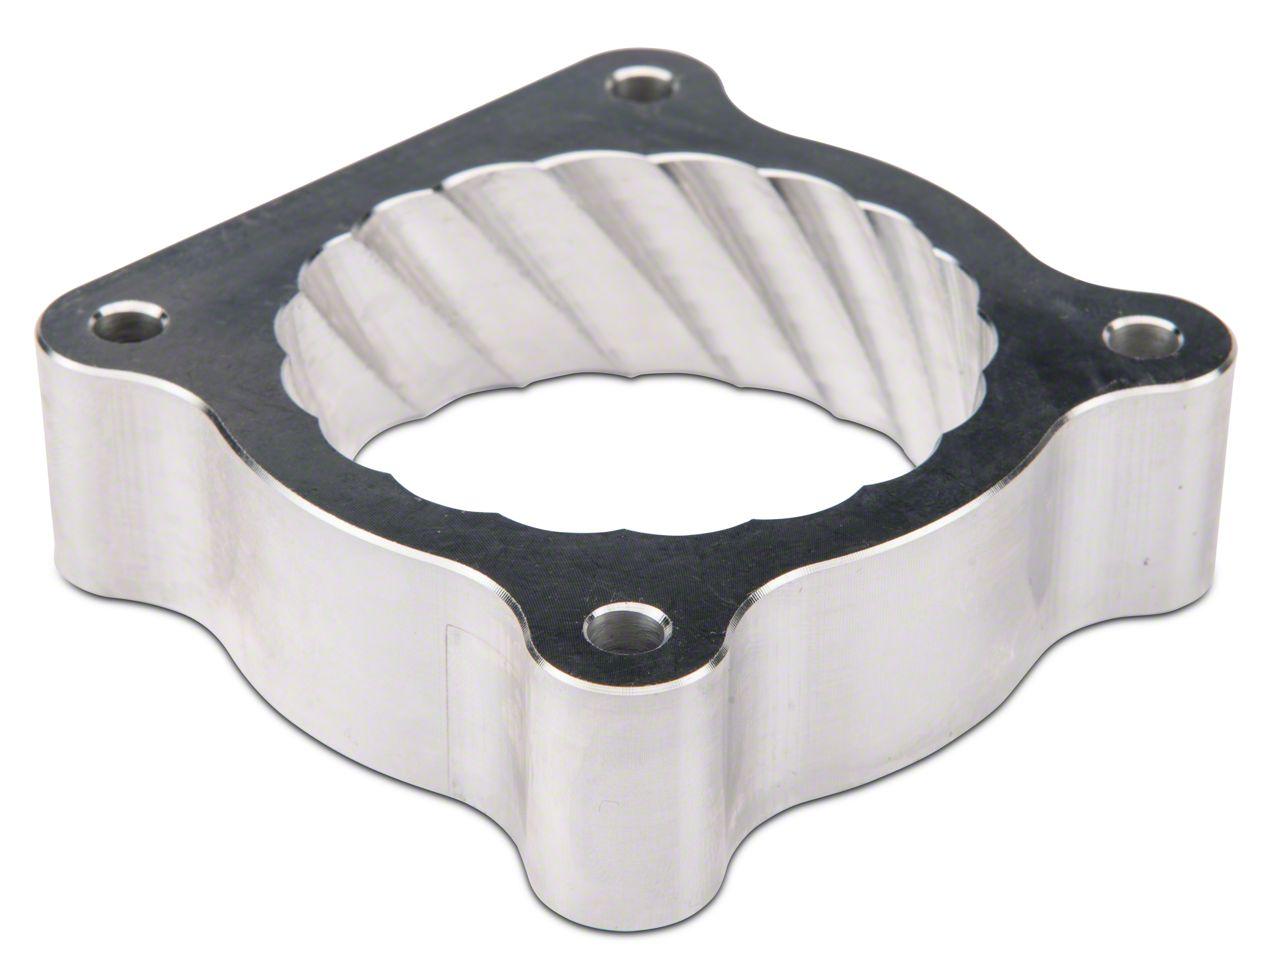 Steeda Throttle Body Spacer (15-19 EcoBoost)